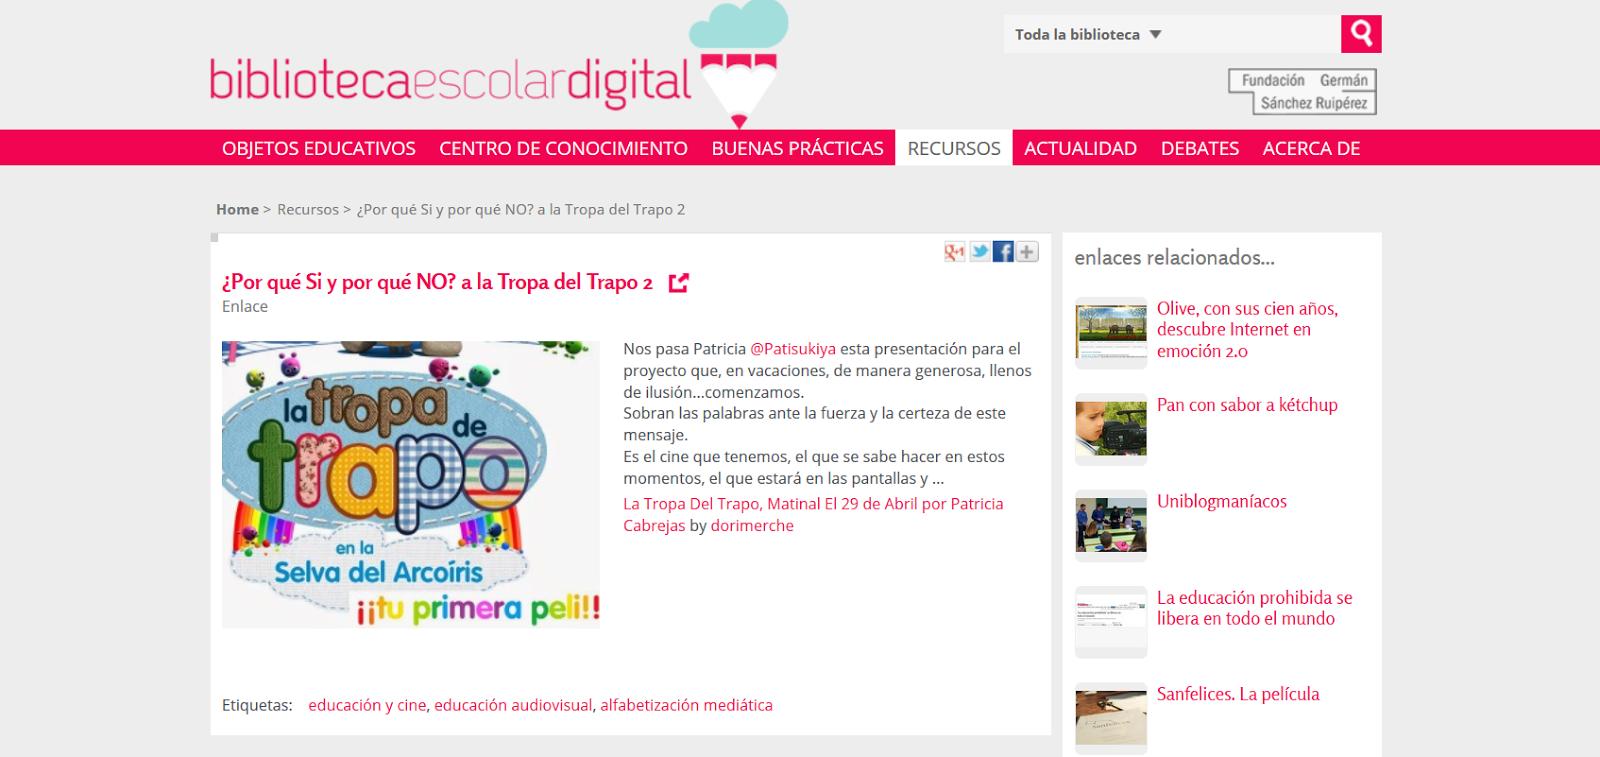 http://bibliotecaescolardigital.es/comunidad/BibliotecaEscolarDigital/recurso/por-que-si-y-por-que-no-a-la-tropa-del-trapo-2/625ad56e-6676-4bfa-b4b6-46e0a11199ea